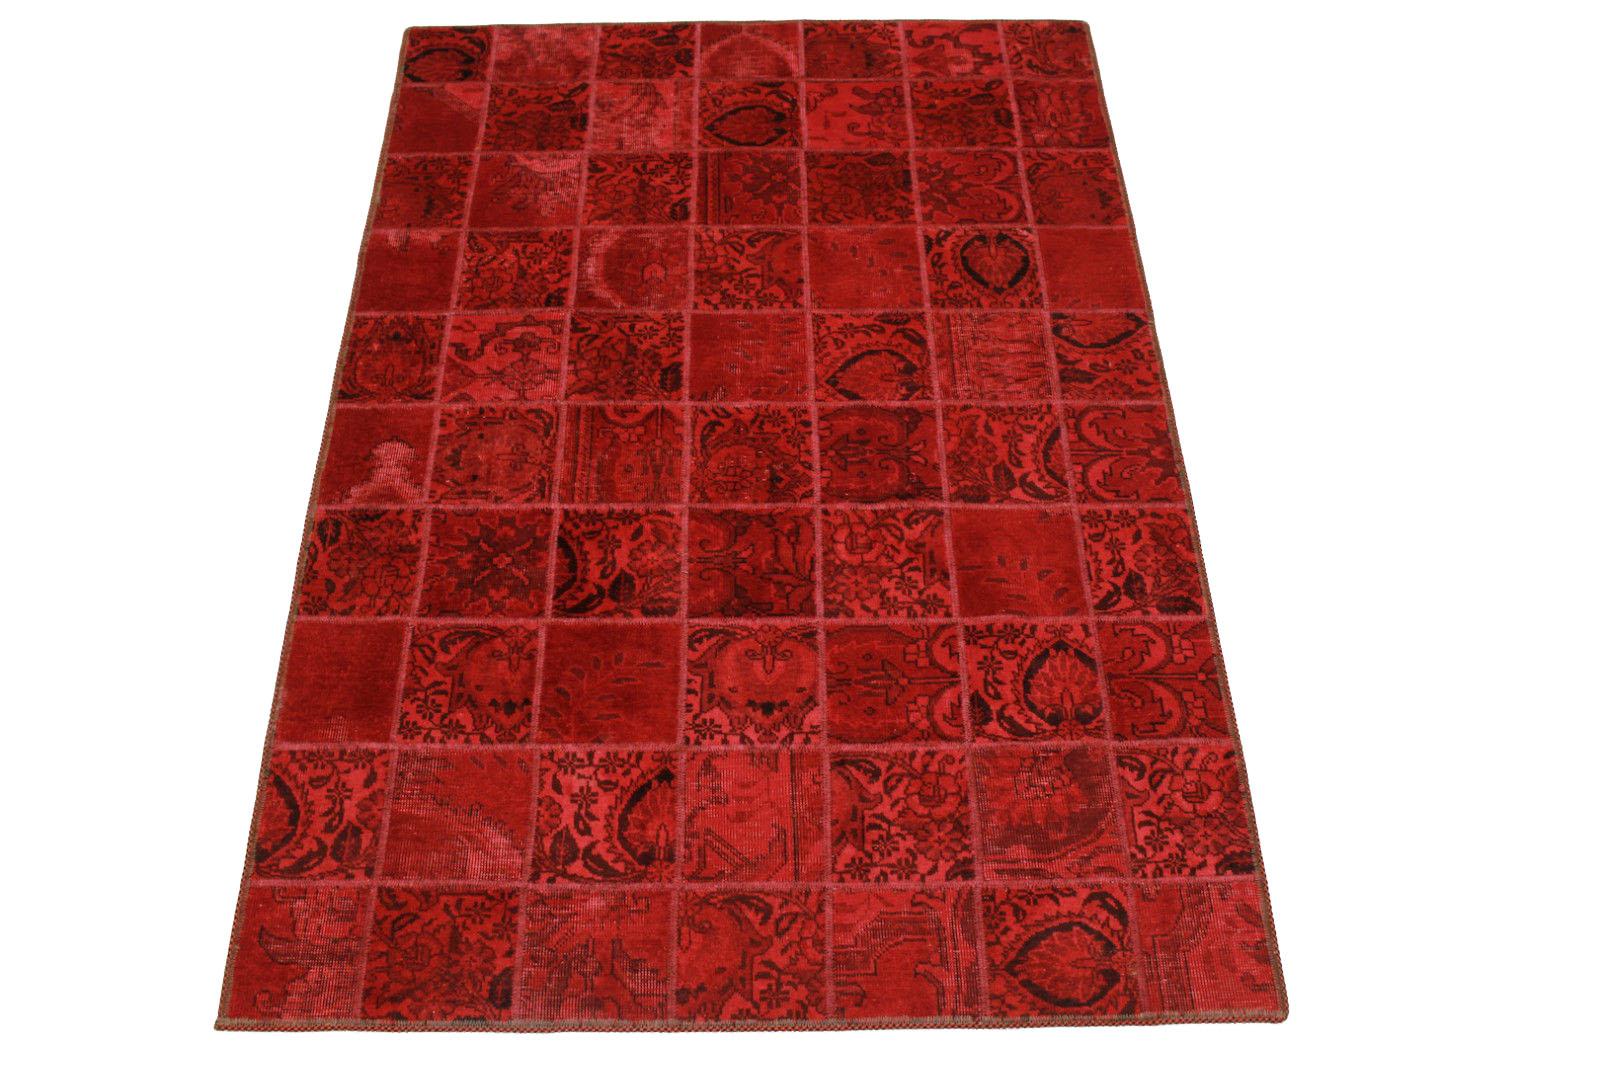 patchwork teppich rot in 200x140cm 1001 2542 bei kaufen. Black Bedroom Furniture Sets. Home Design Ideas